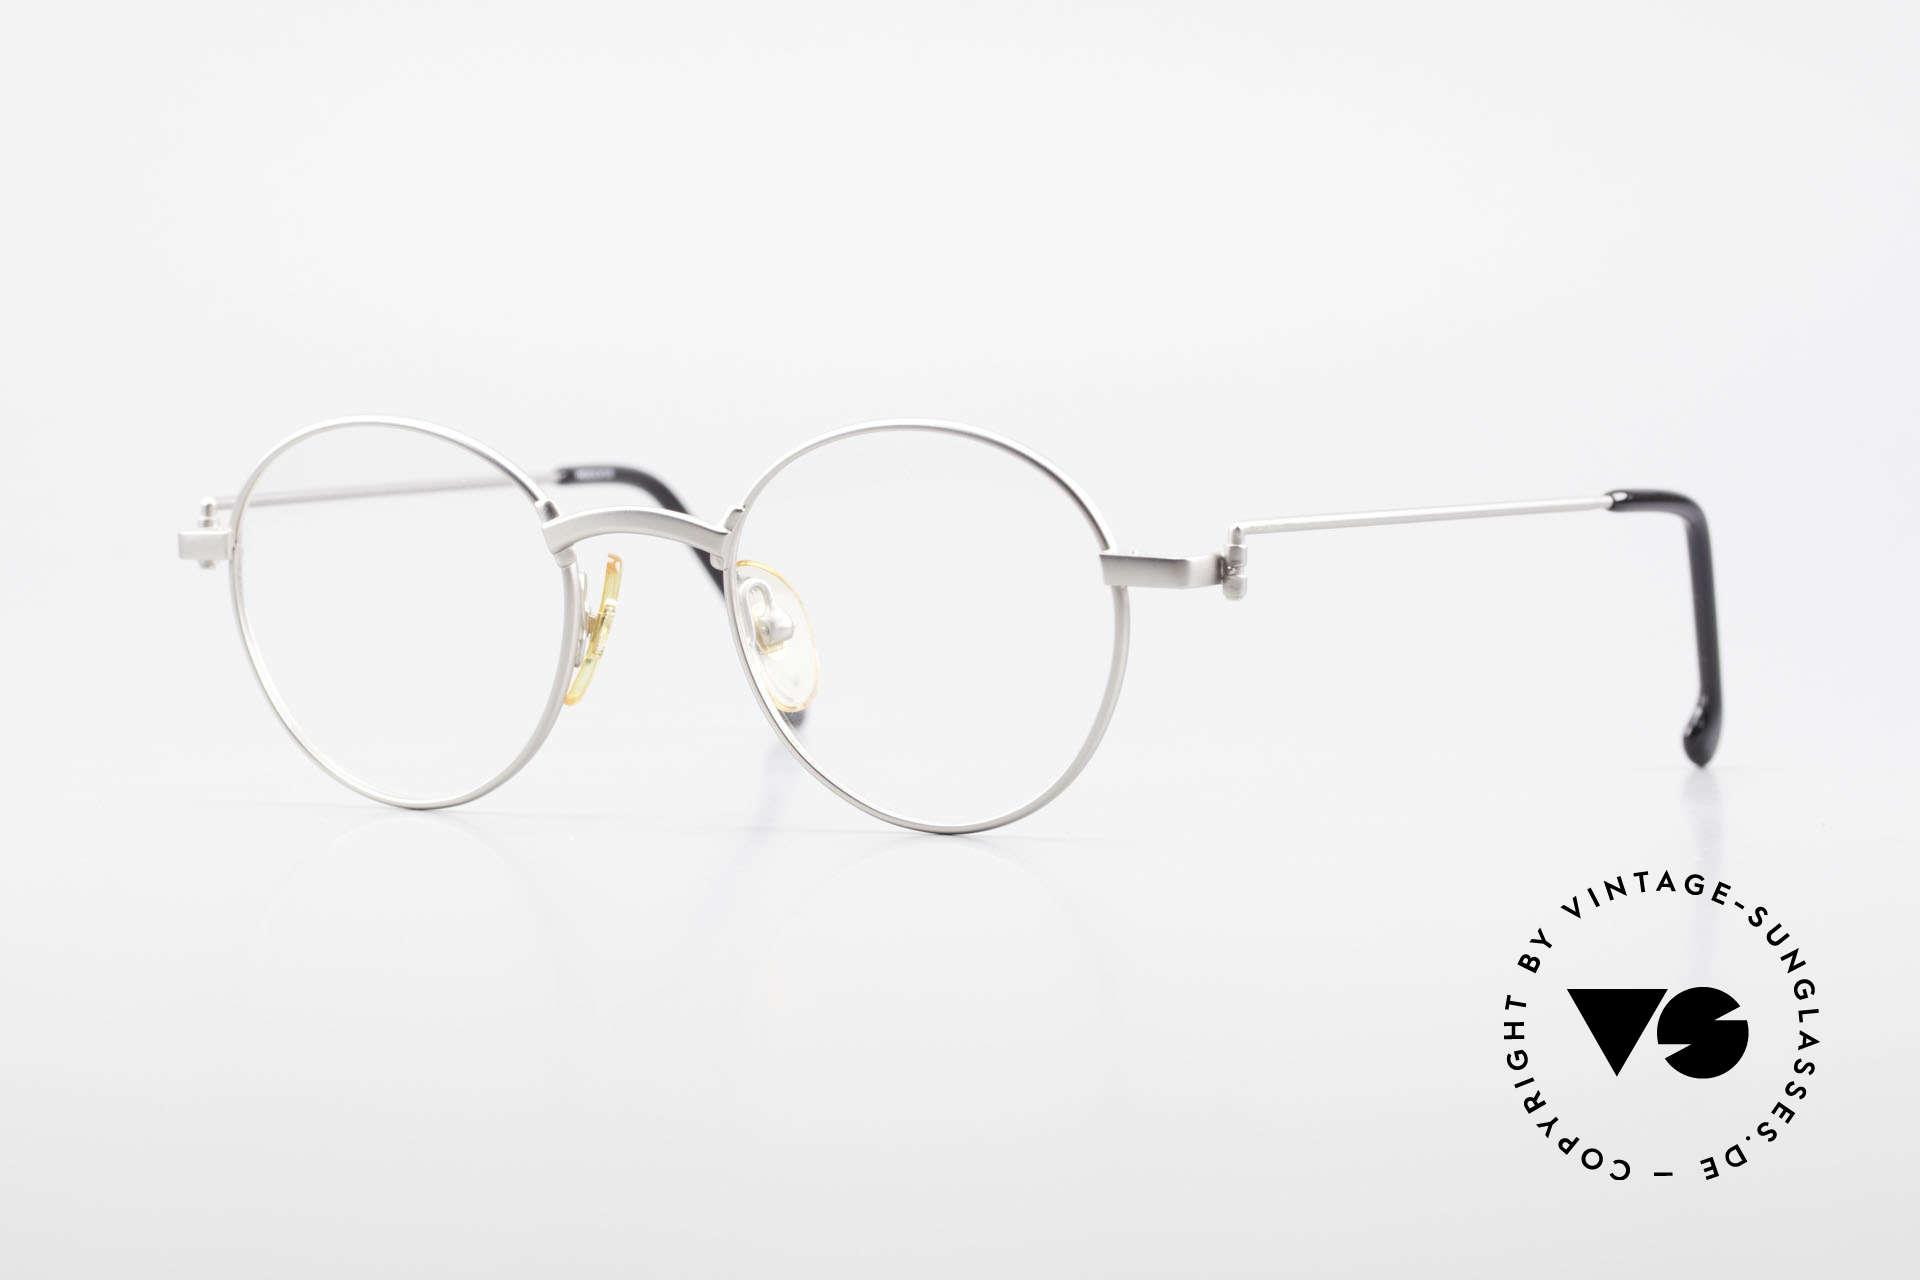 W Proksch's M32/8 Panto Glasses 90s Avantgarde, Proksch's vintage Titanium eyeglasses from 1993, Made for Men